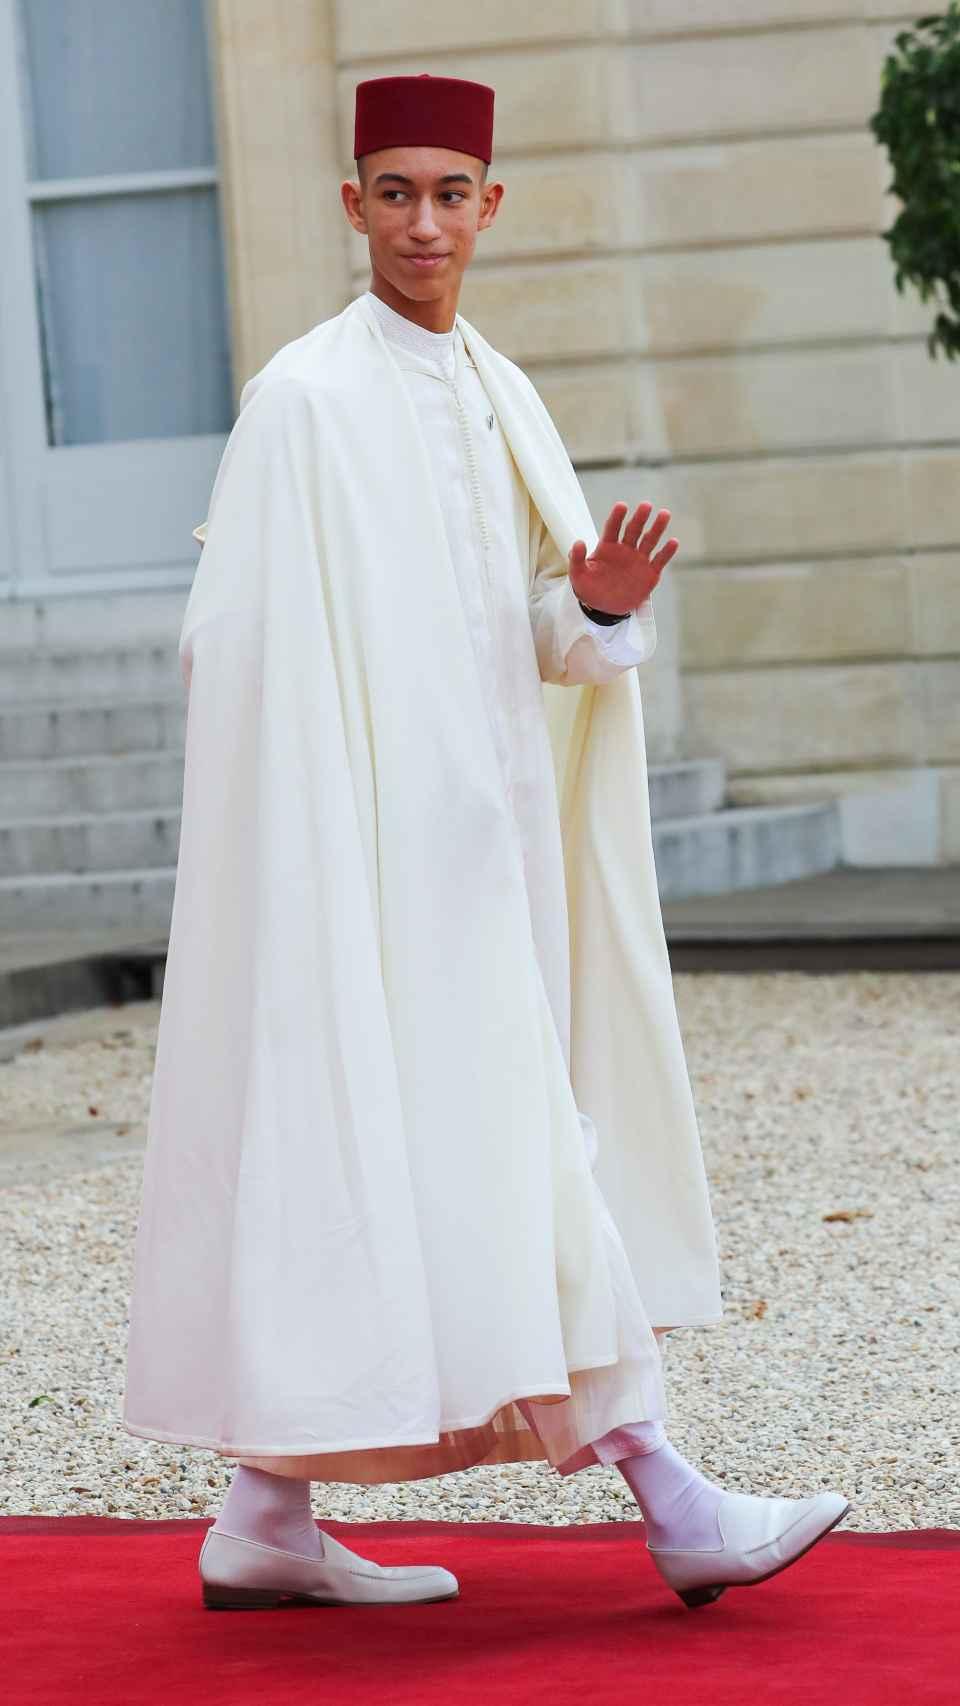 El príncipe Moulay Hassan de Marruecos en el funeral de Jacques Chirac en septiembre de 2019 en París.